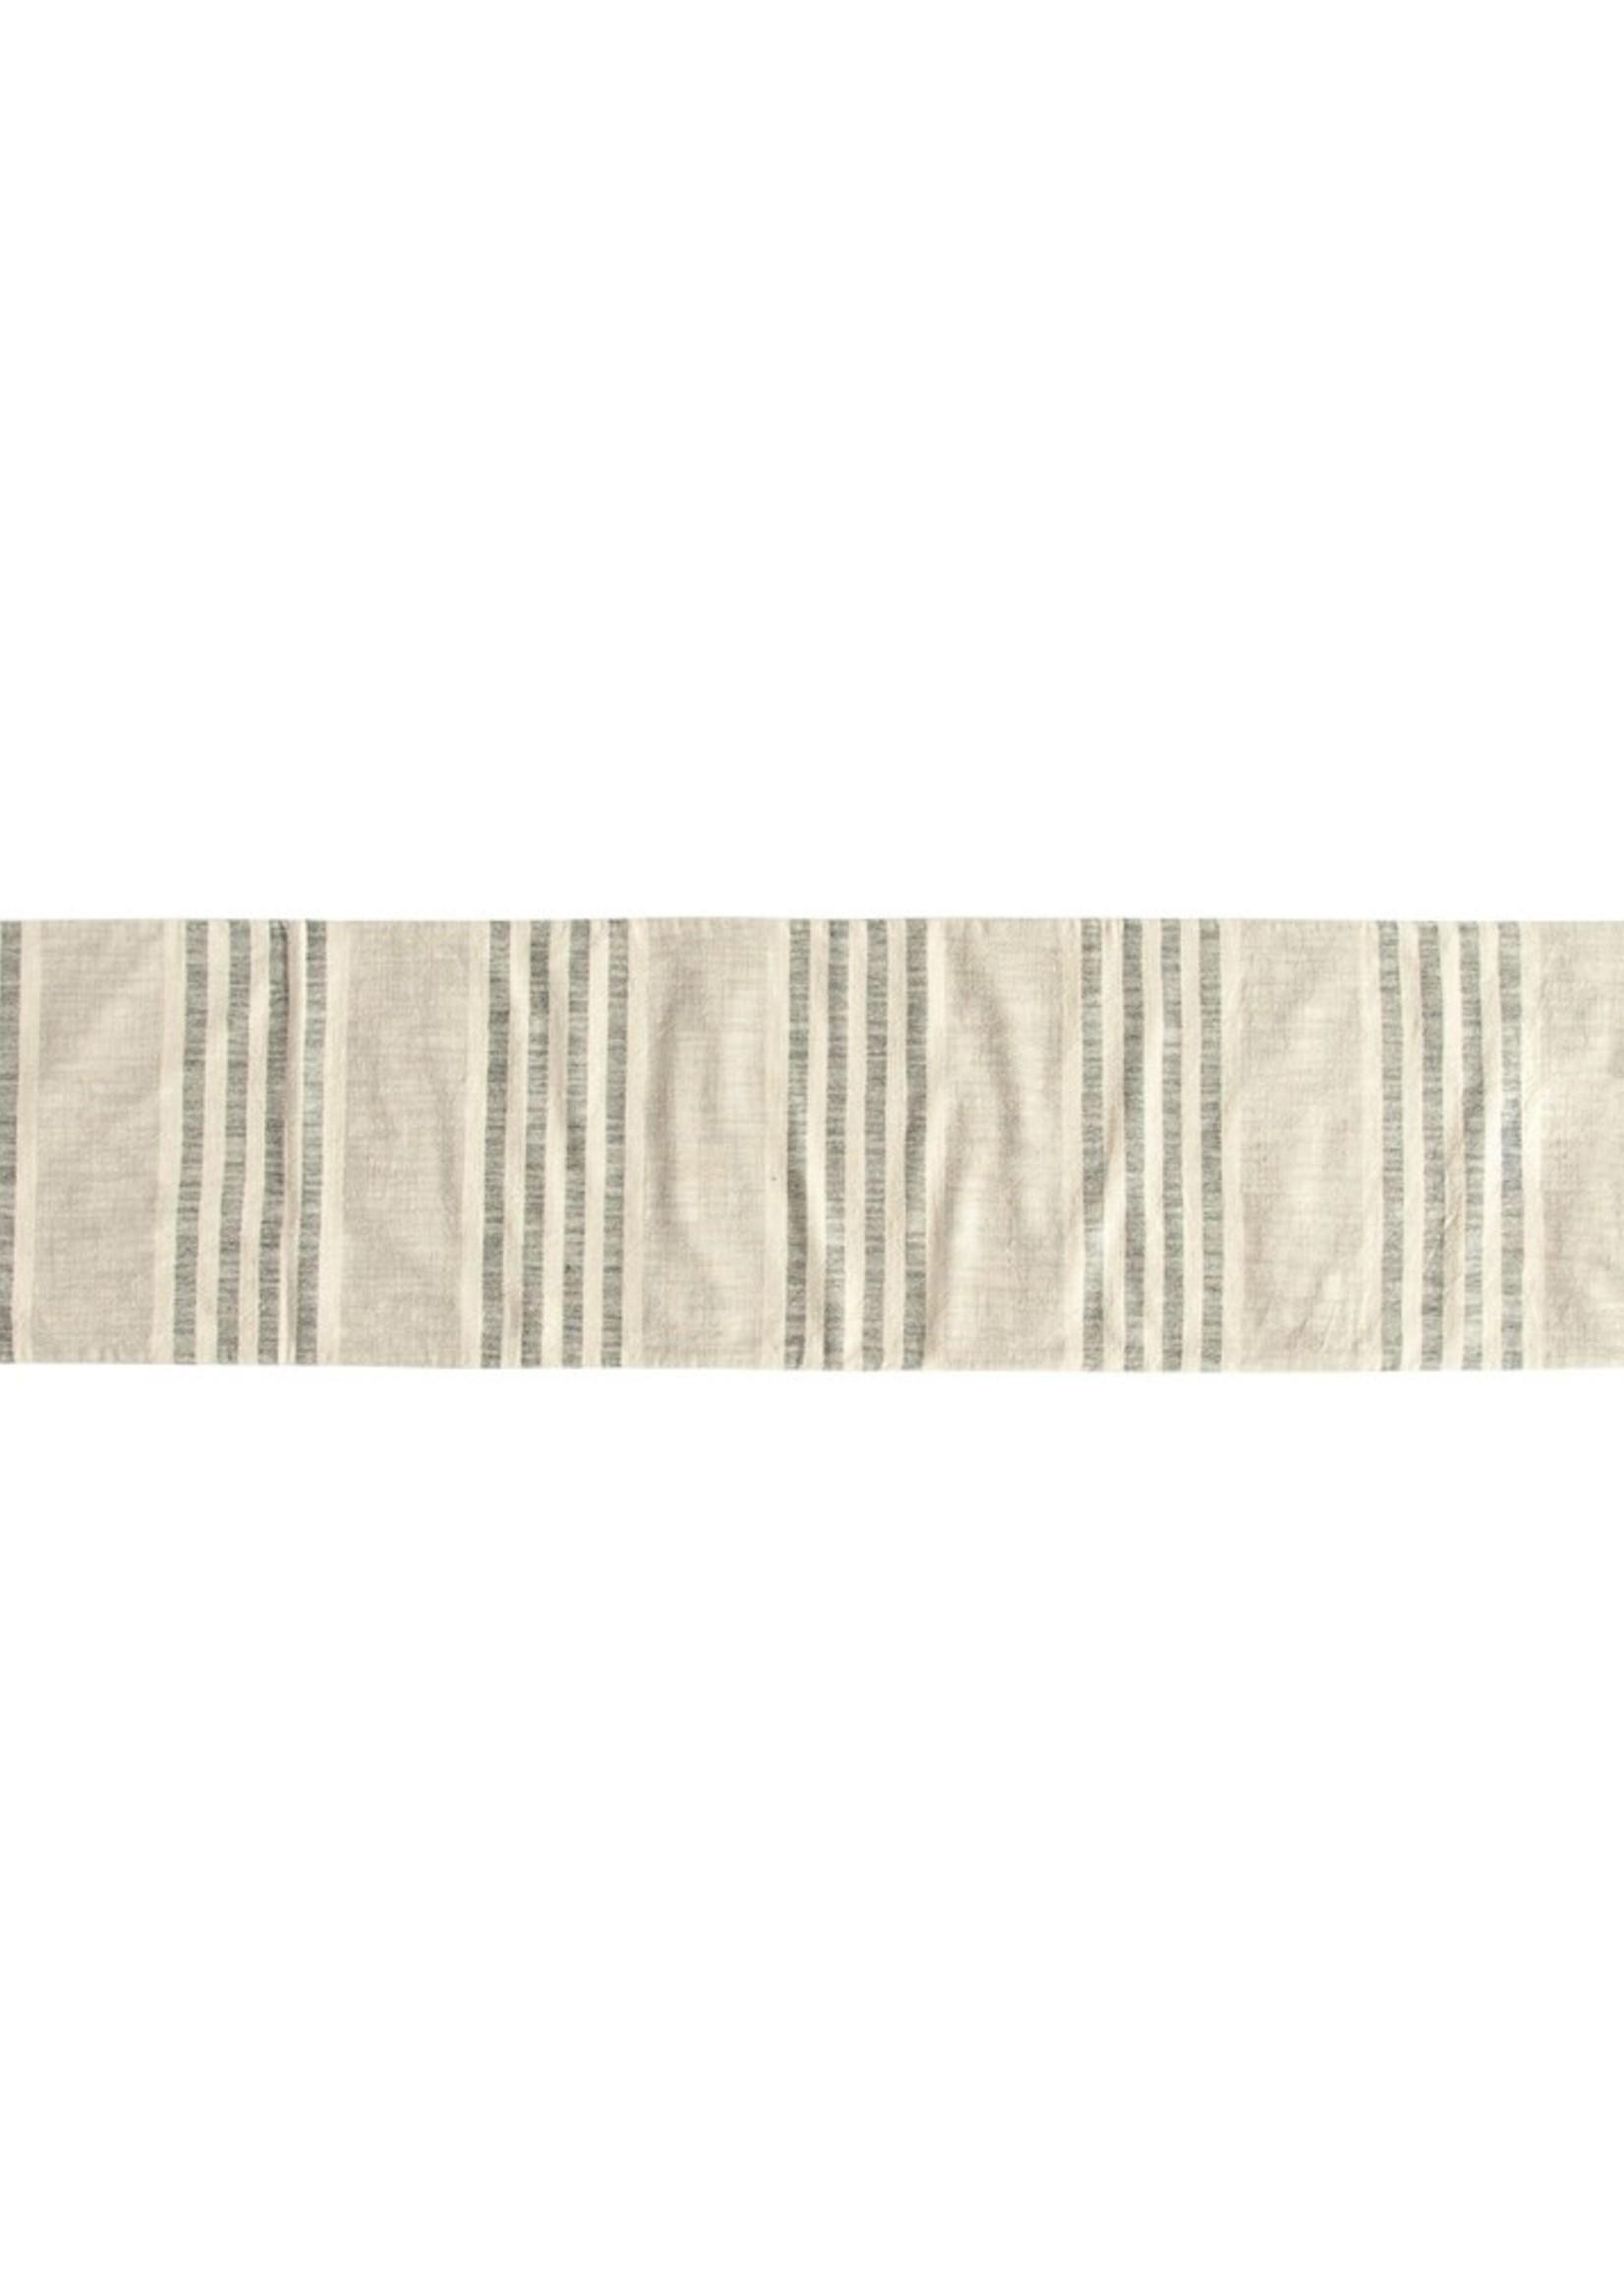 Woven Cotton Striped Table Runner, Black & Cream